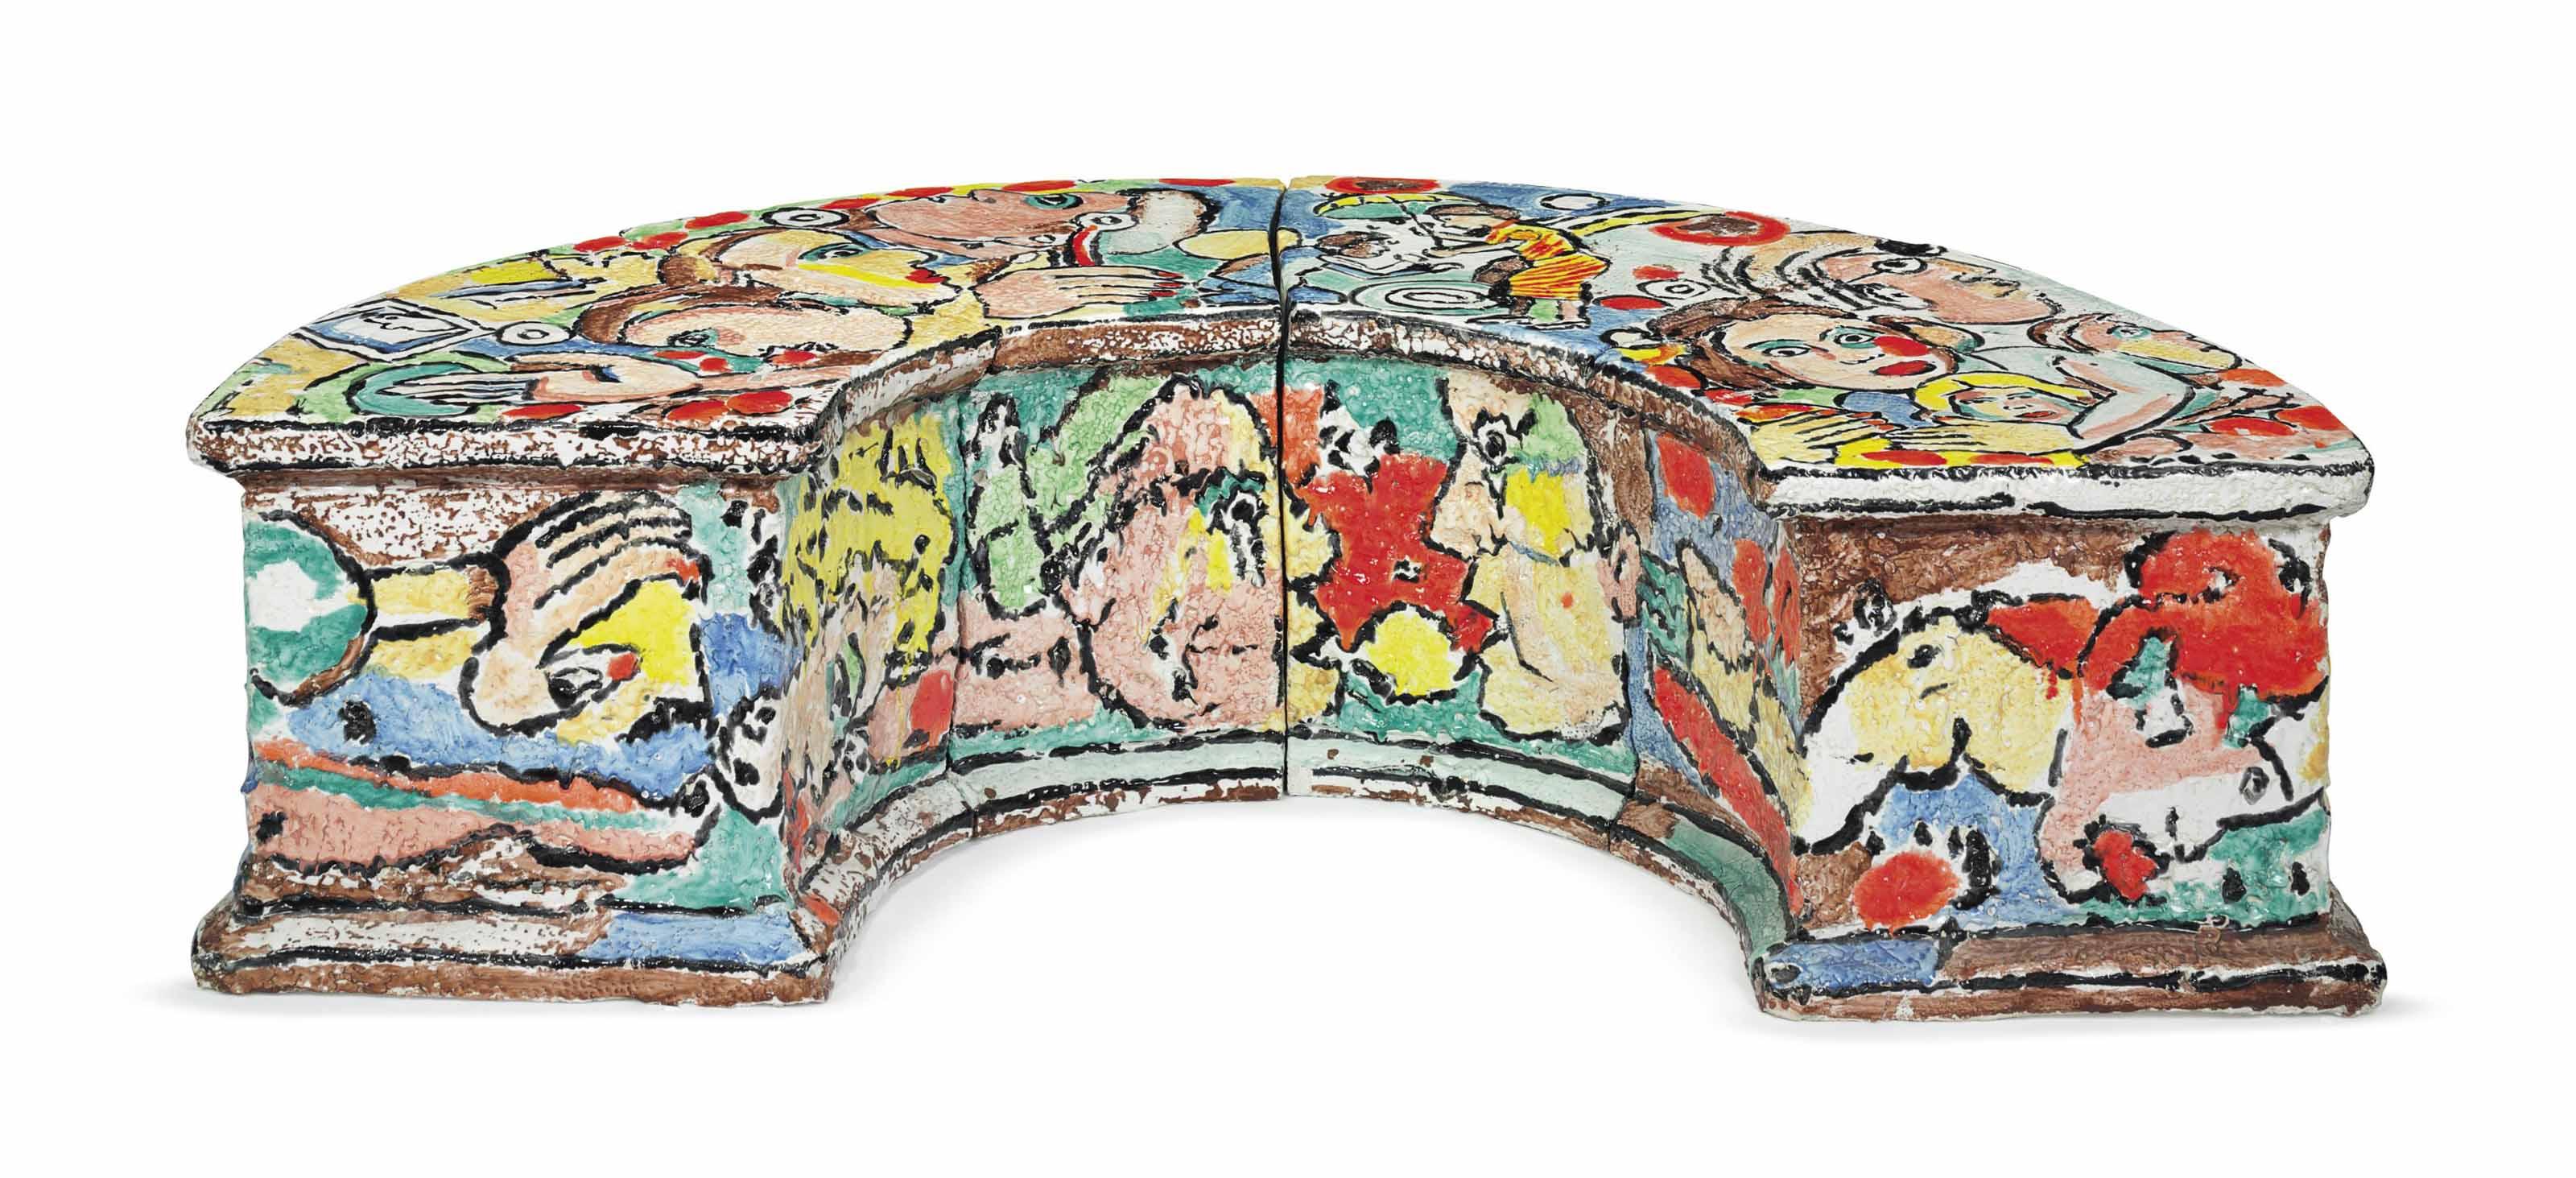 Untitled Bench (Half)